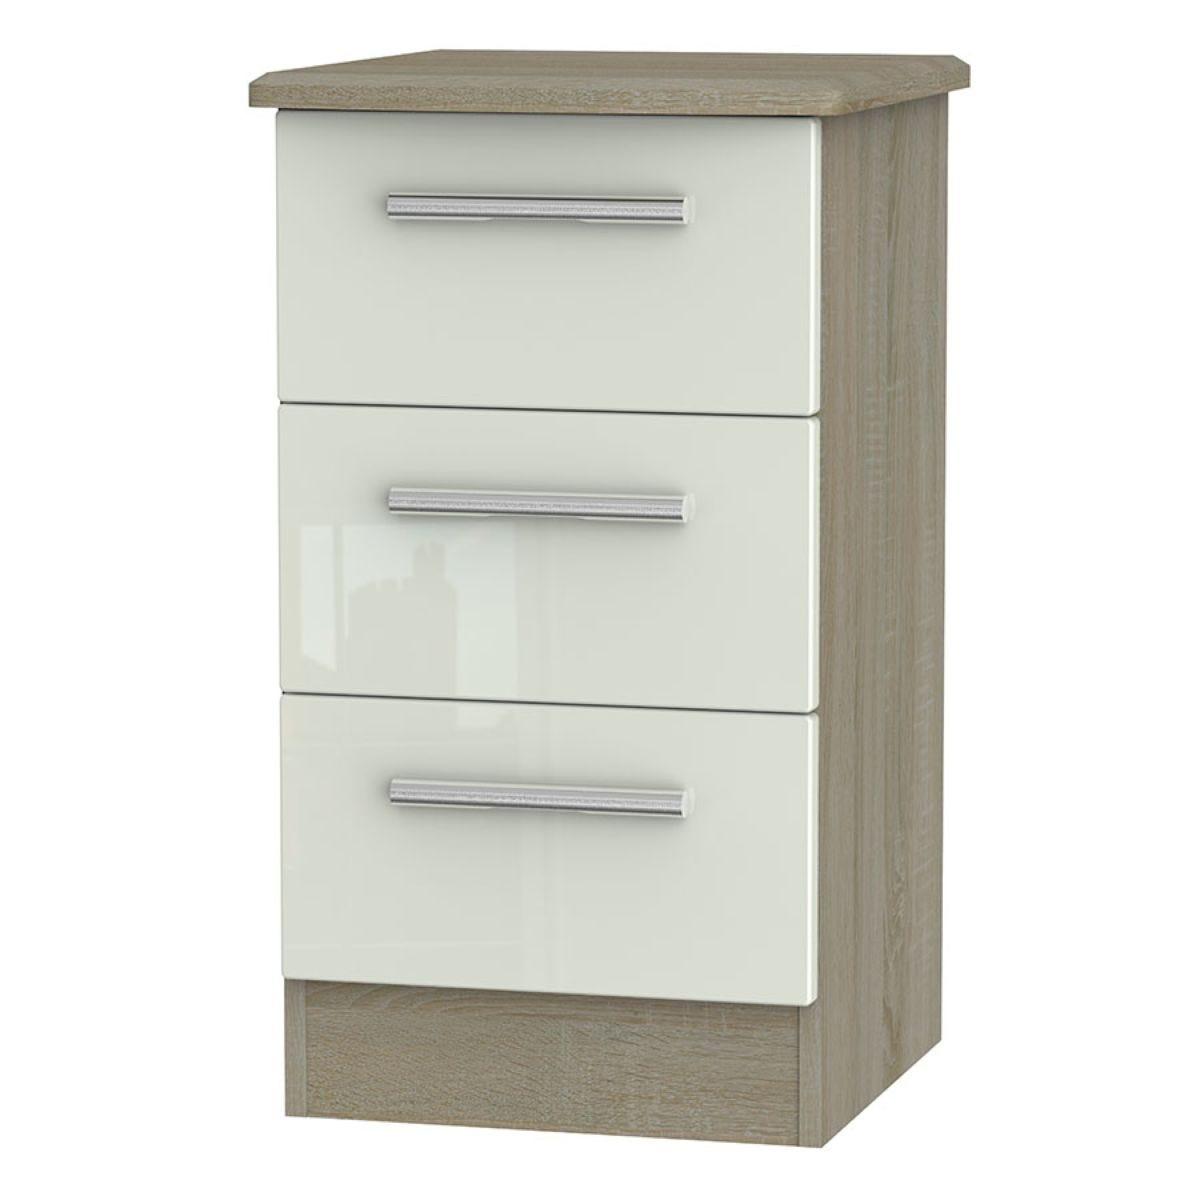 Kirkhill 3-Drawer Bedside Table - Taupe Cedar